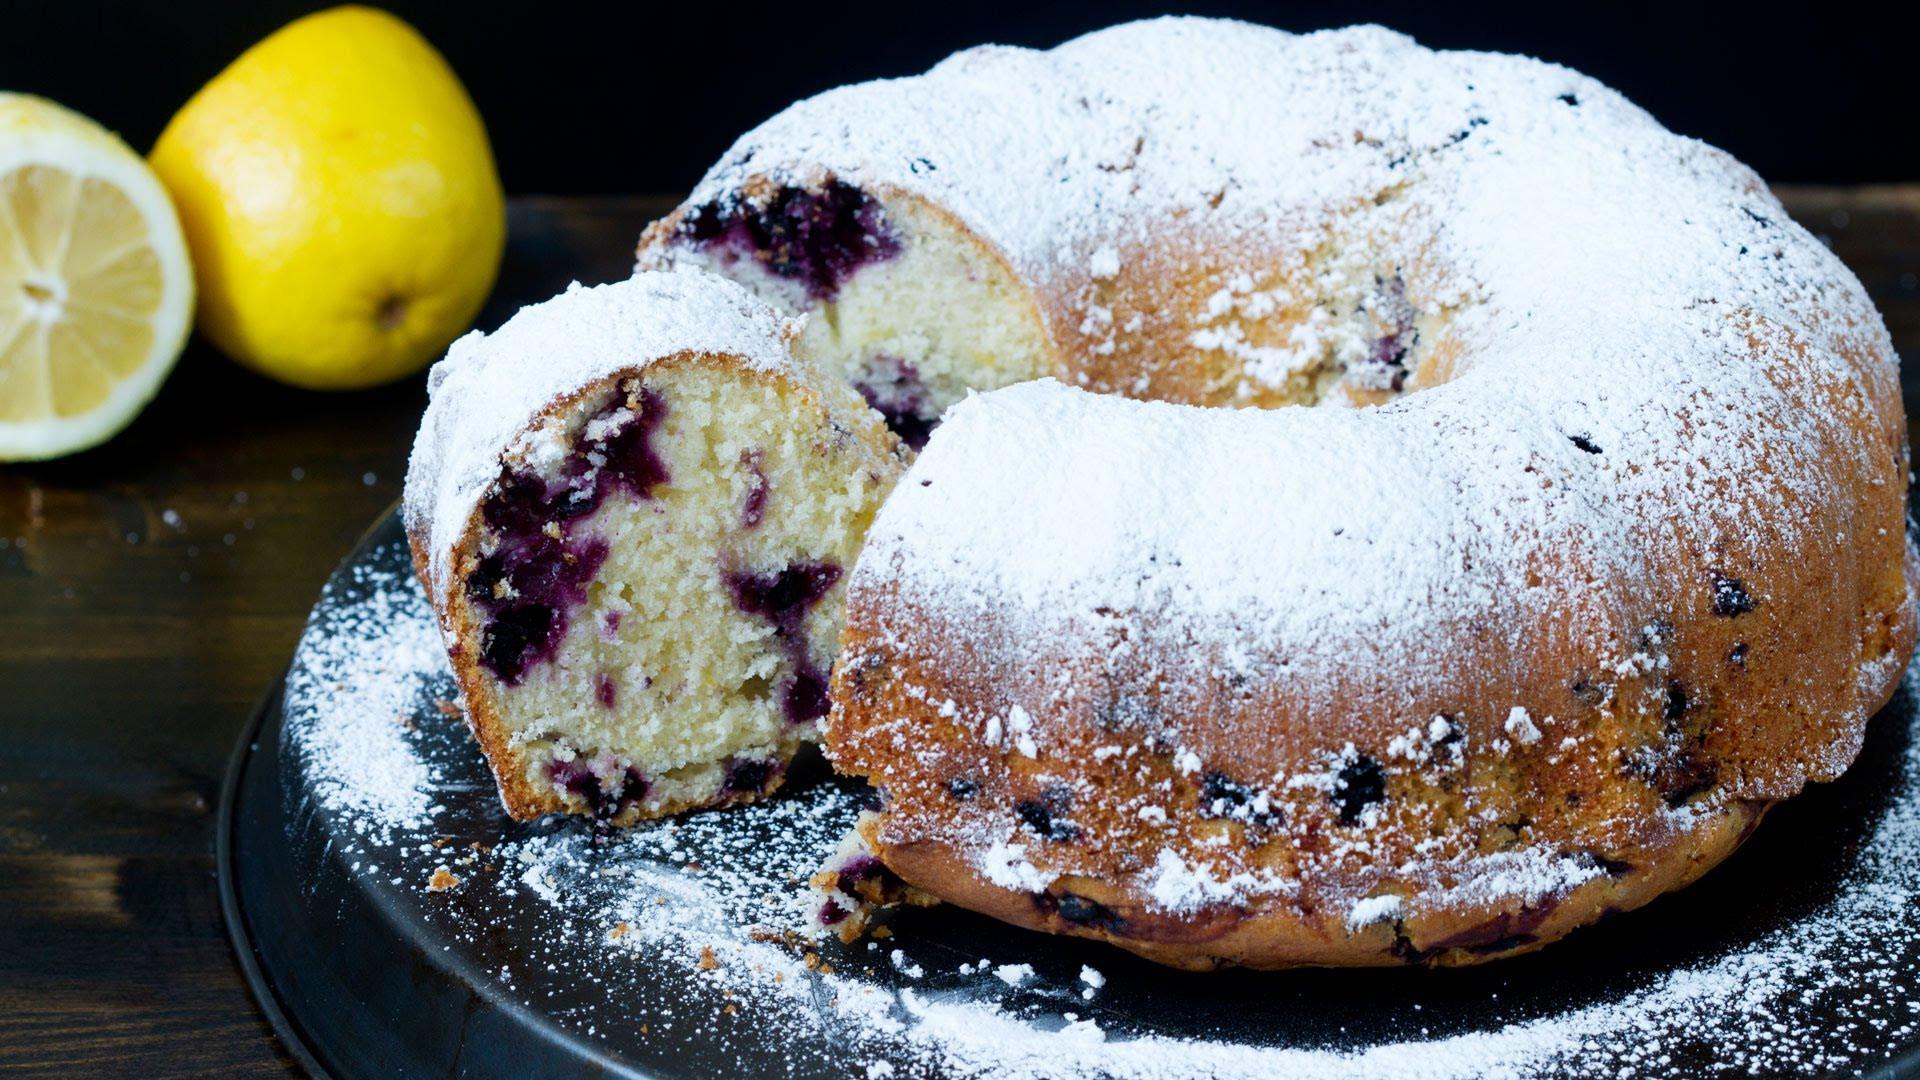 Lemon Blueberry Bundt Cake  Blueberry Lemon Bundt Cake Recipe